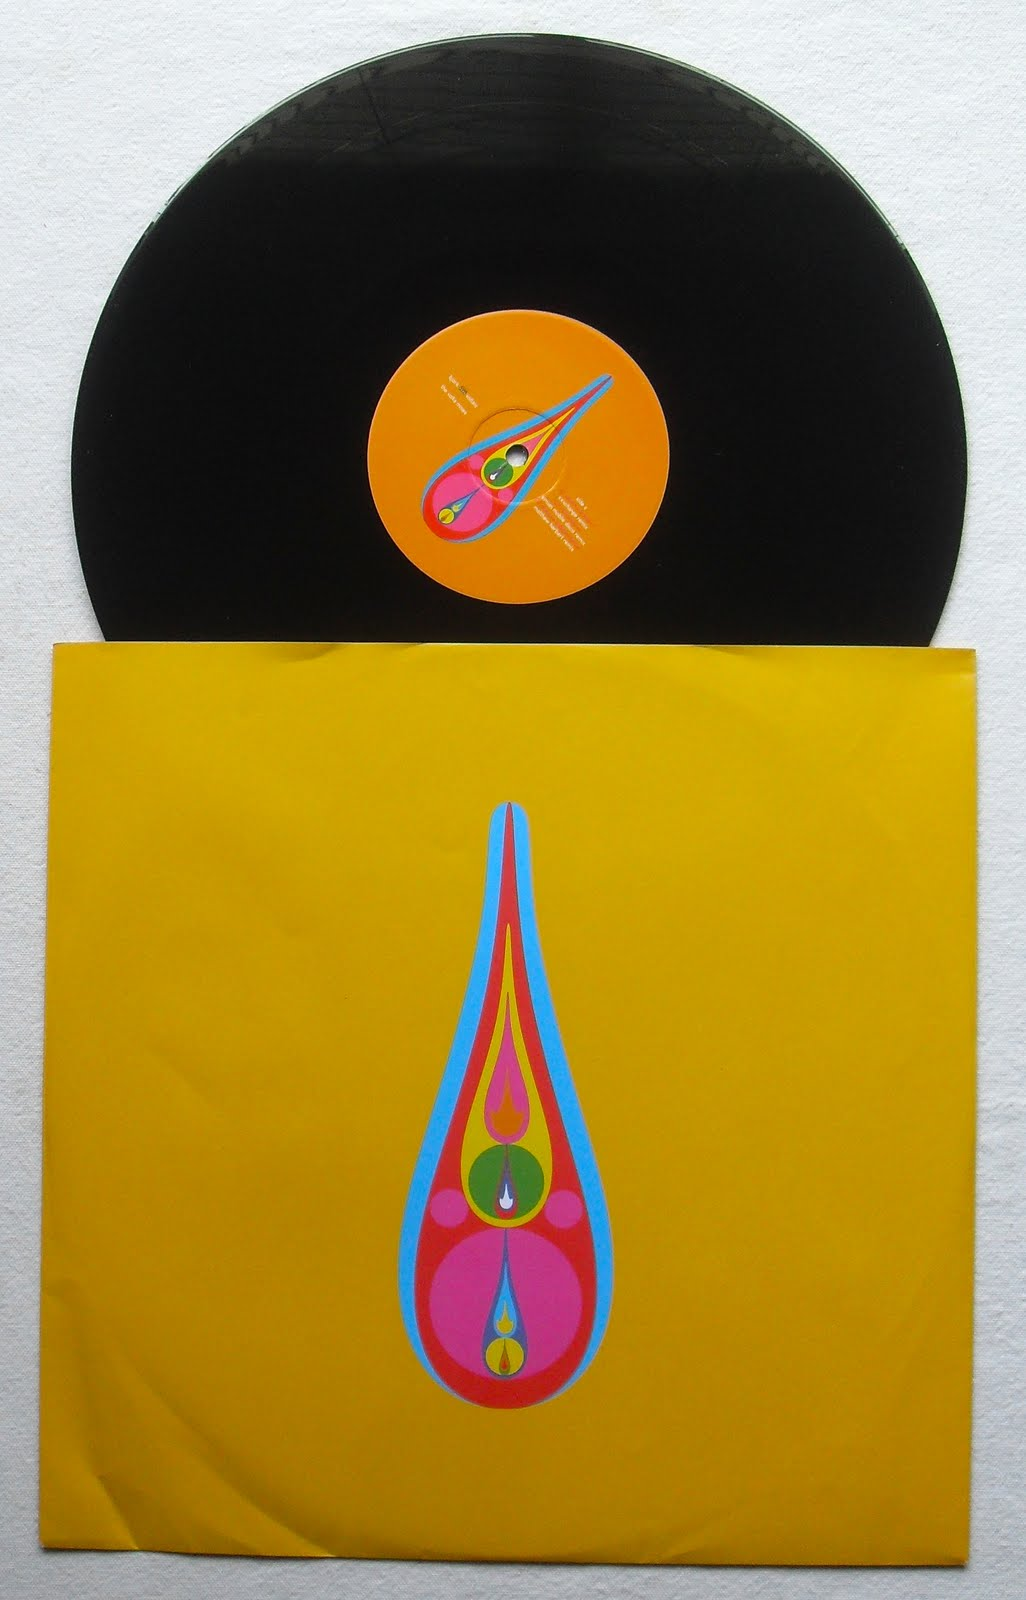 http://4.bp.blogspot.com/-0q9tlMIAyxc/TgNXjuqiytI/AAAAAAAAEiM/cnKxygbMbNU/s1600/BJORK+Voltaic+2009+LImited+Edition+Double+Vinyl+DVD+CD+Box+Set+LP+Record+Album+B.JPG